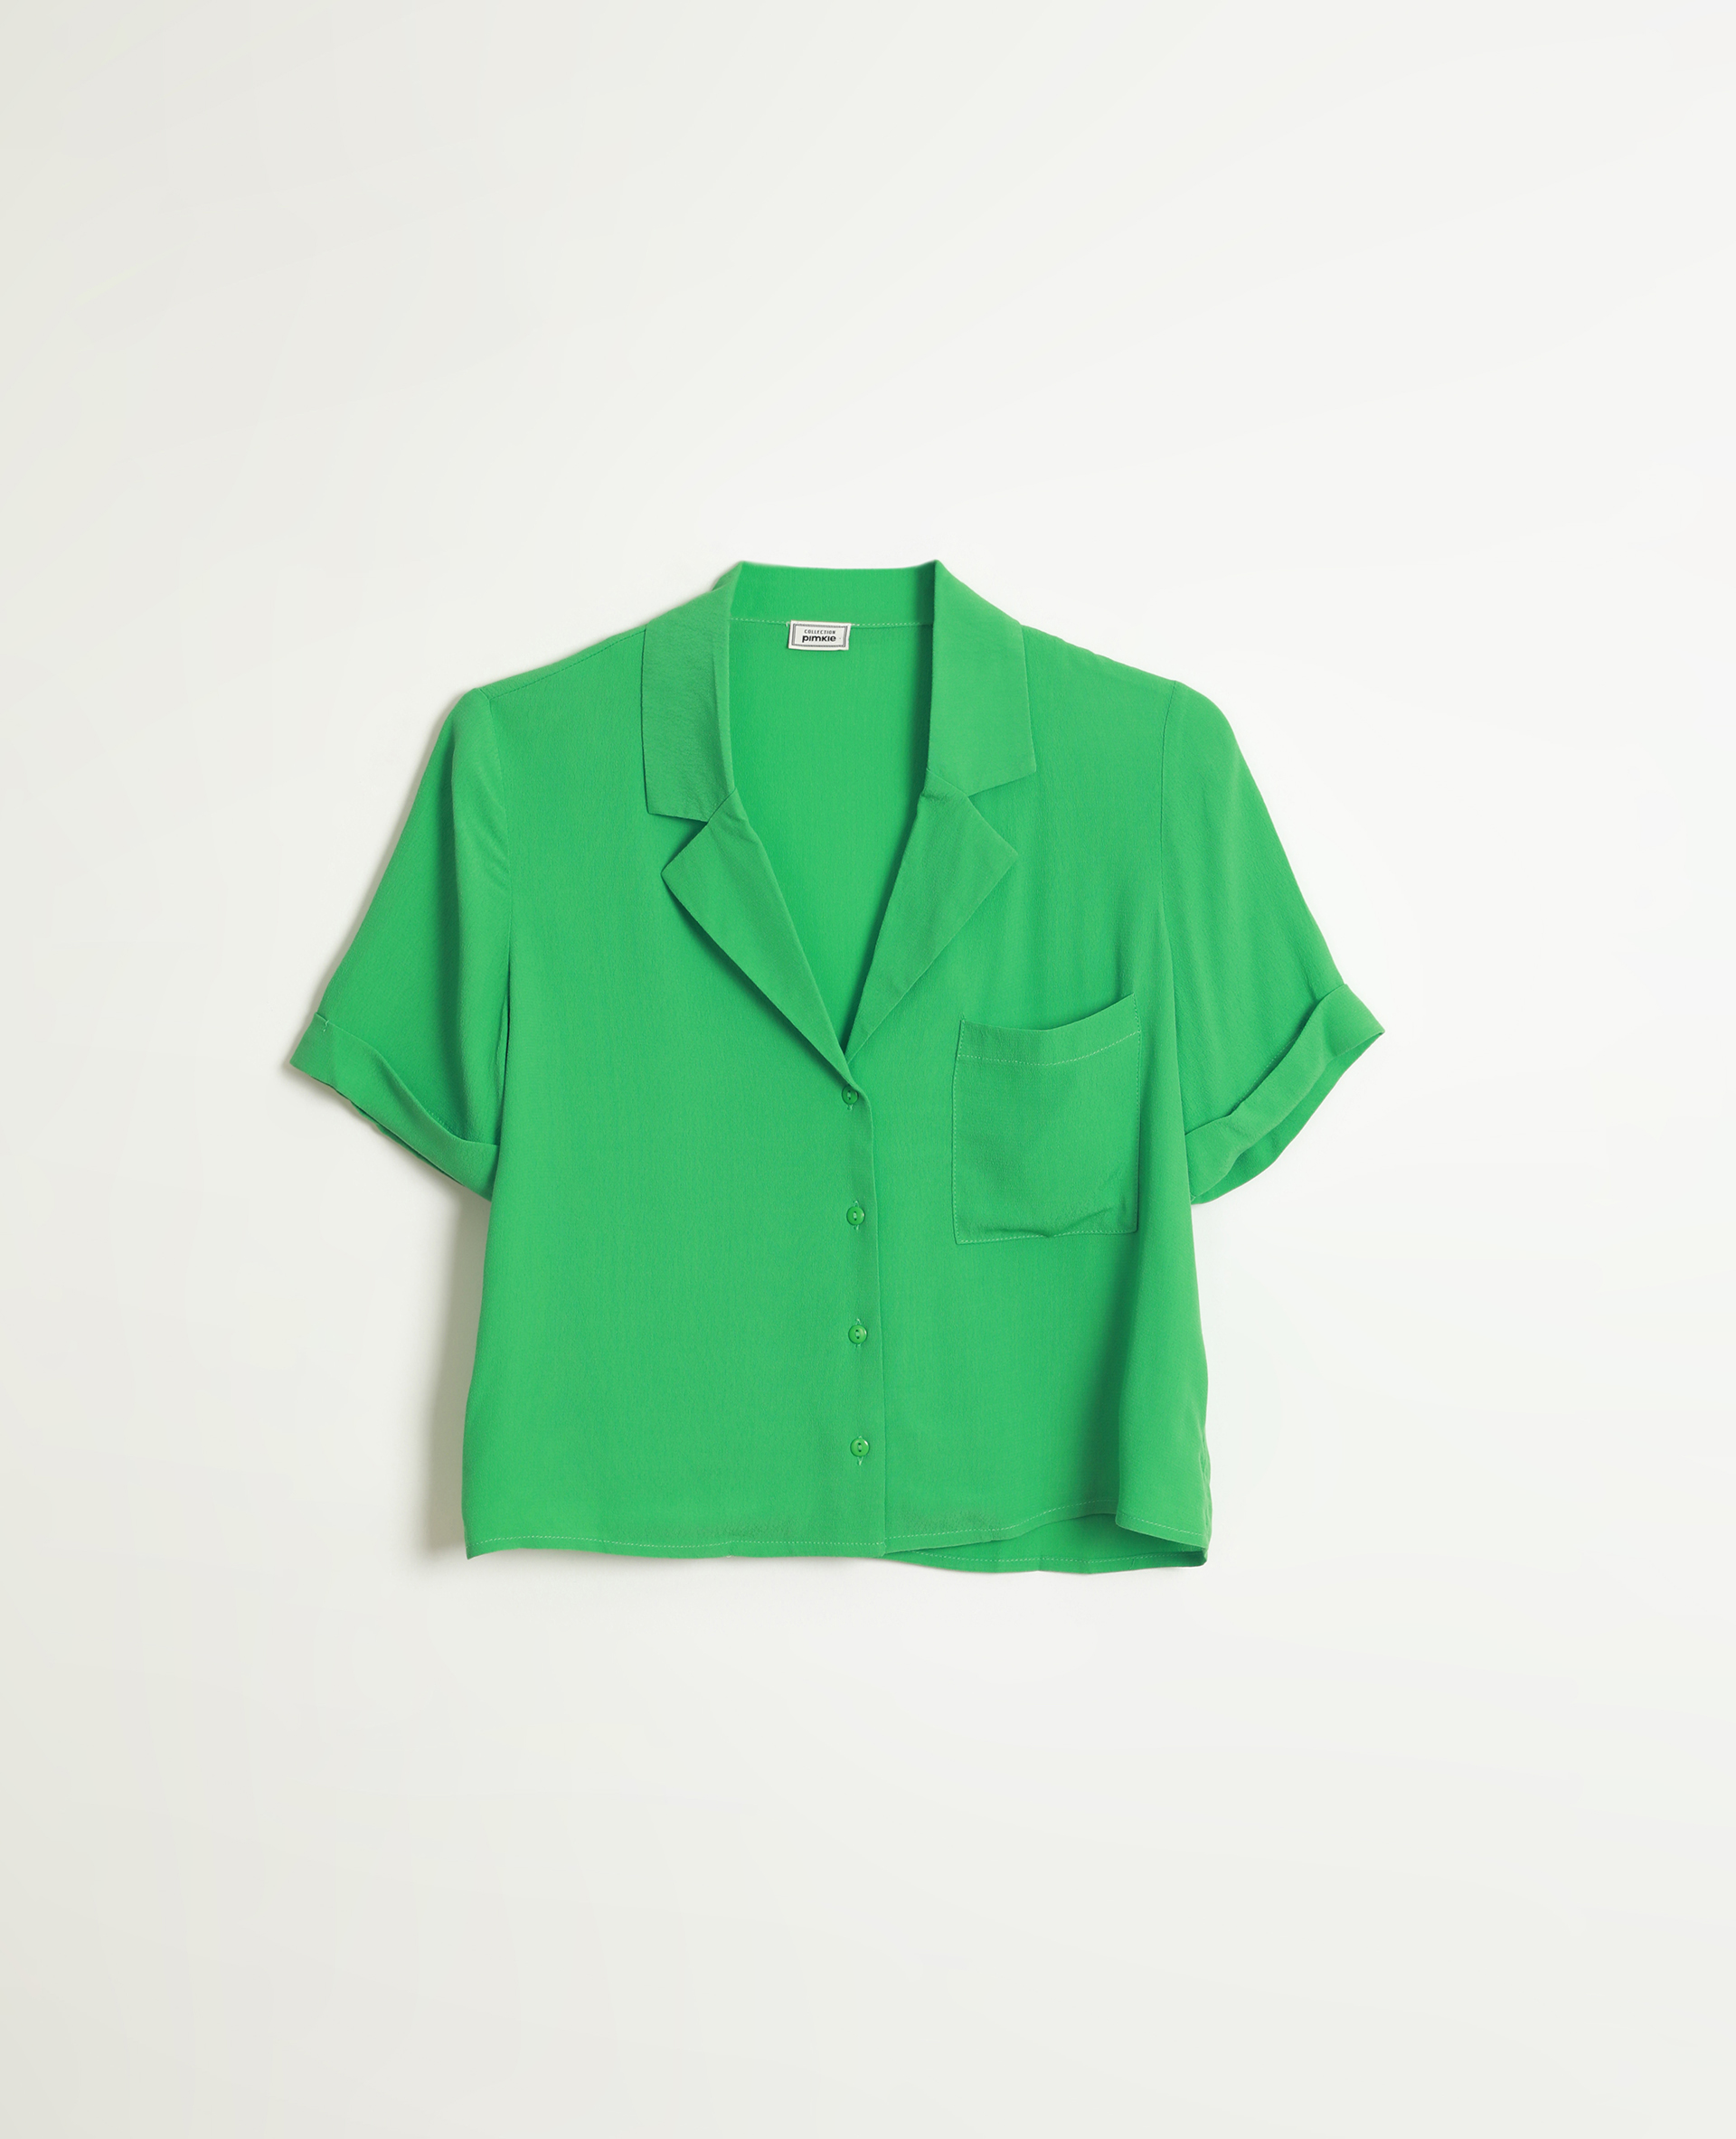 Chemise vert - Pimkie